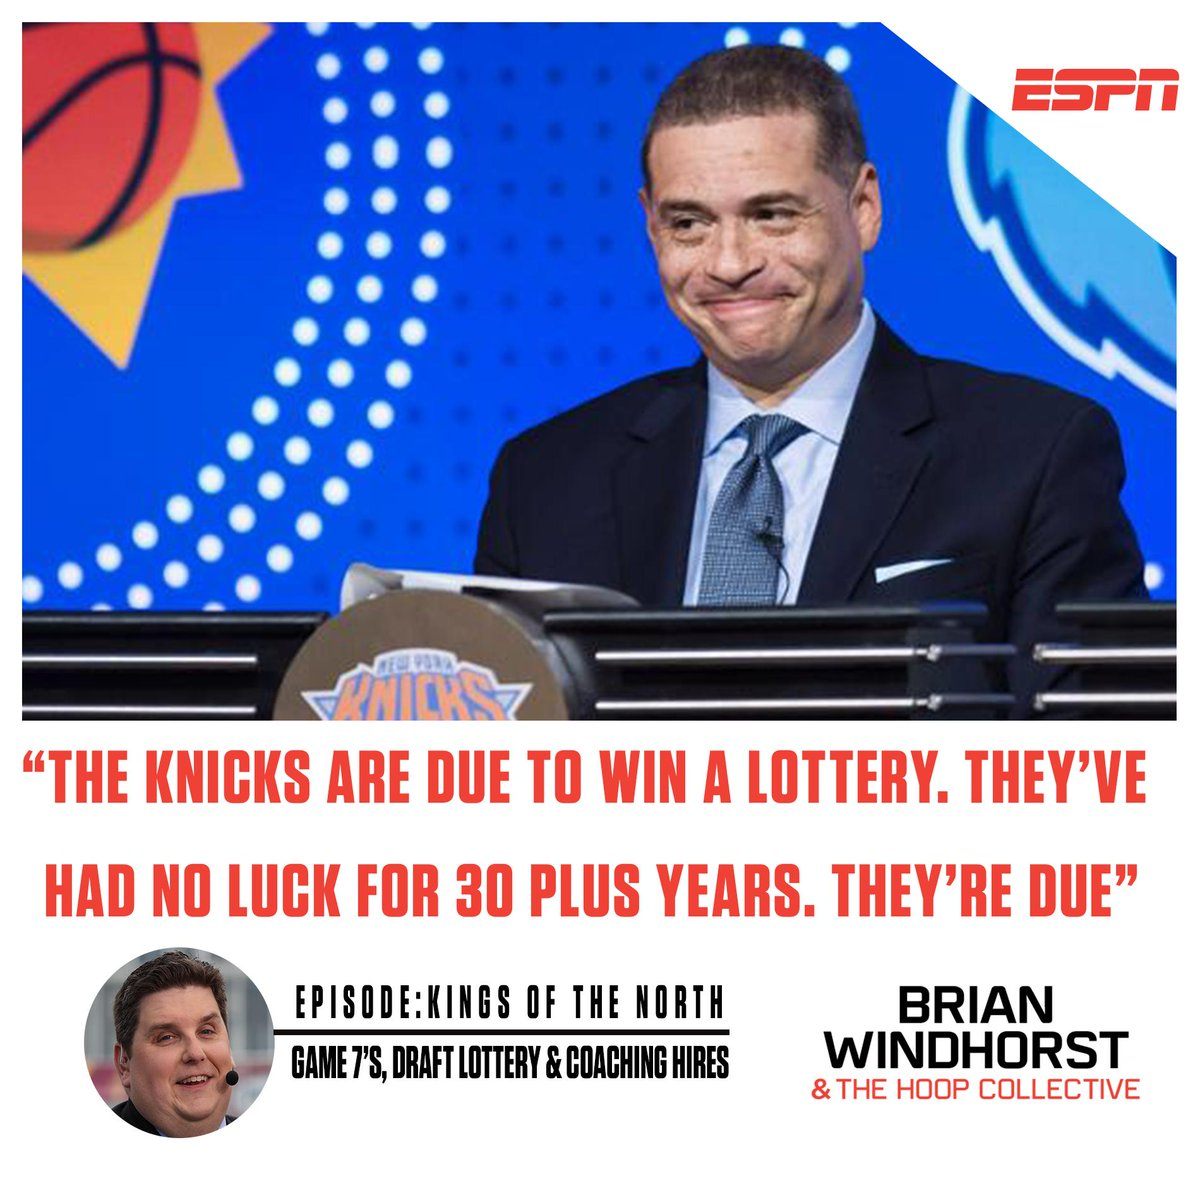 ESPN Podcasts's photo on #phivstor